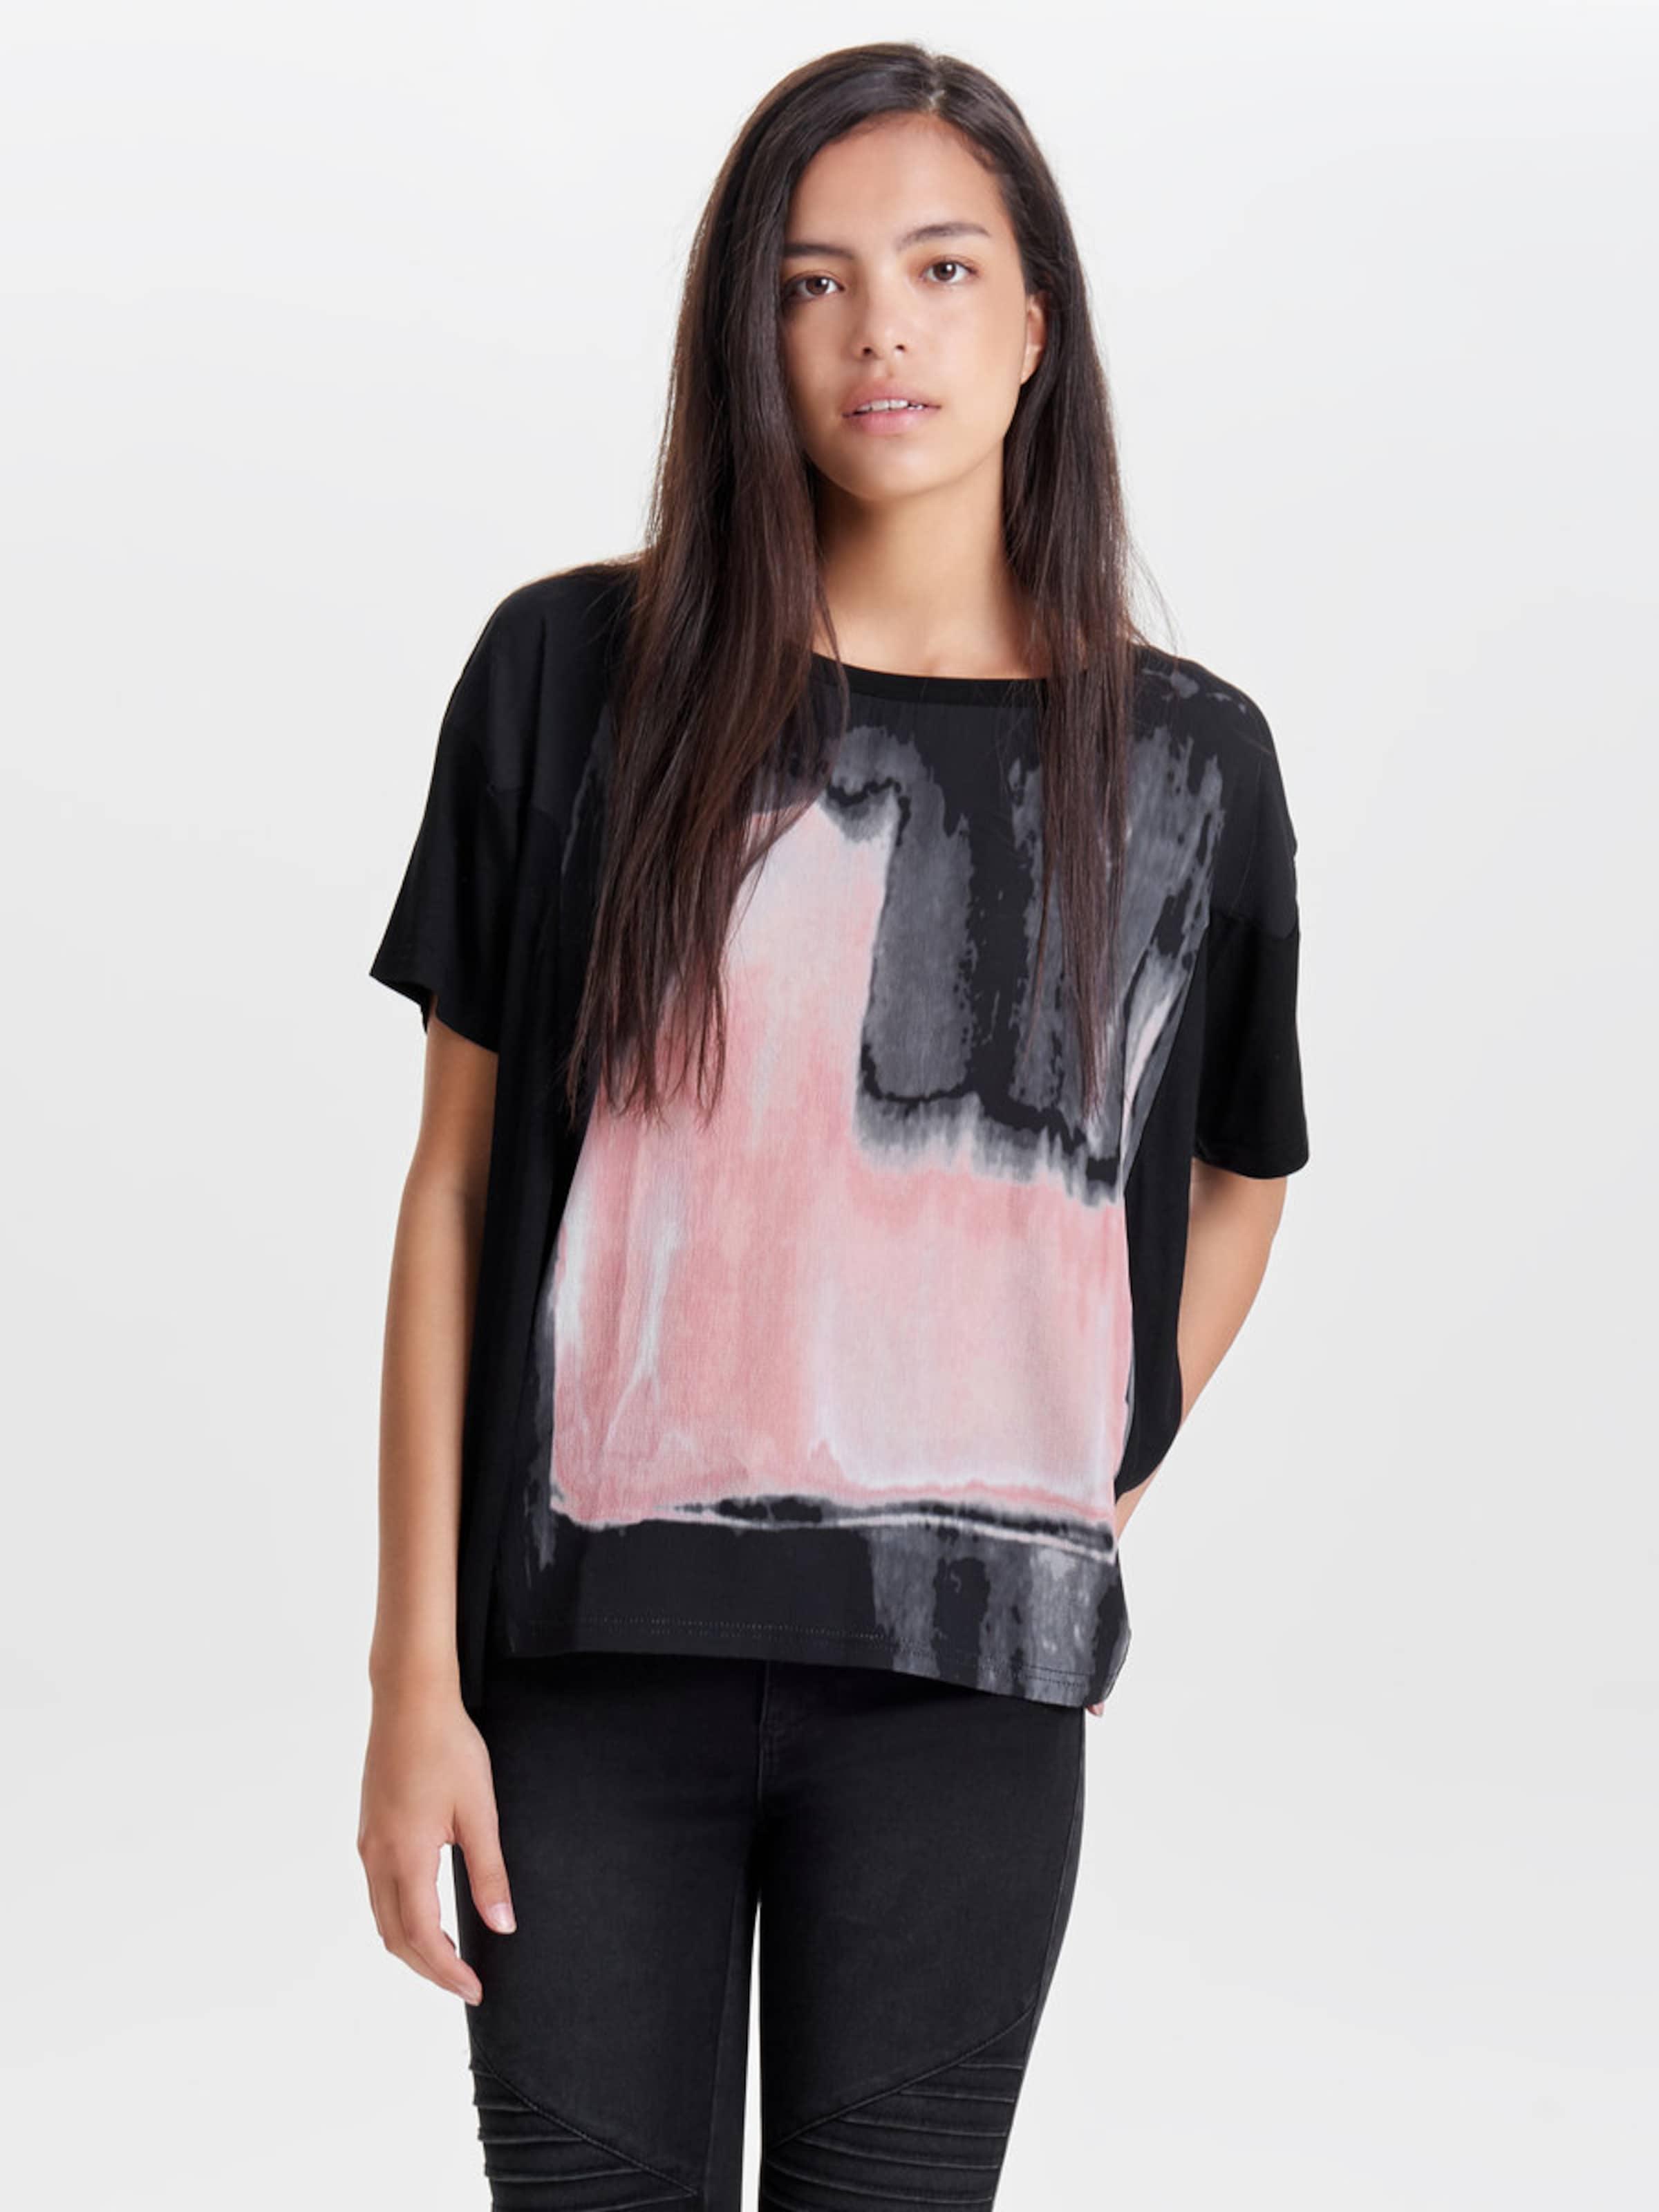 ONLY Oversize-T-Shirt Steckdose Freies Verschiffen Authentische sddIN6Ejt